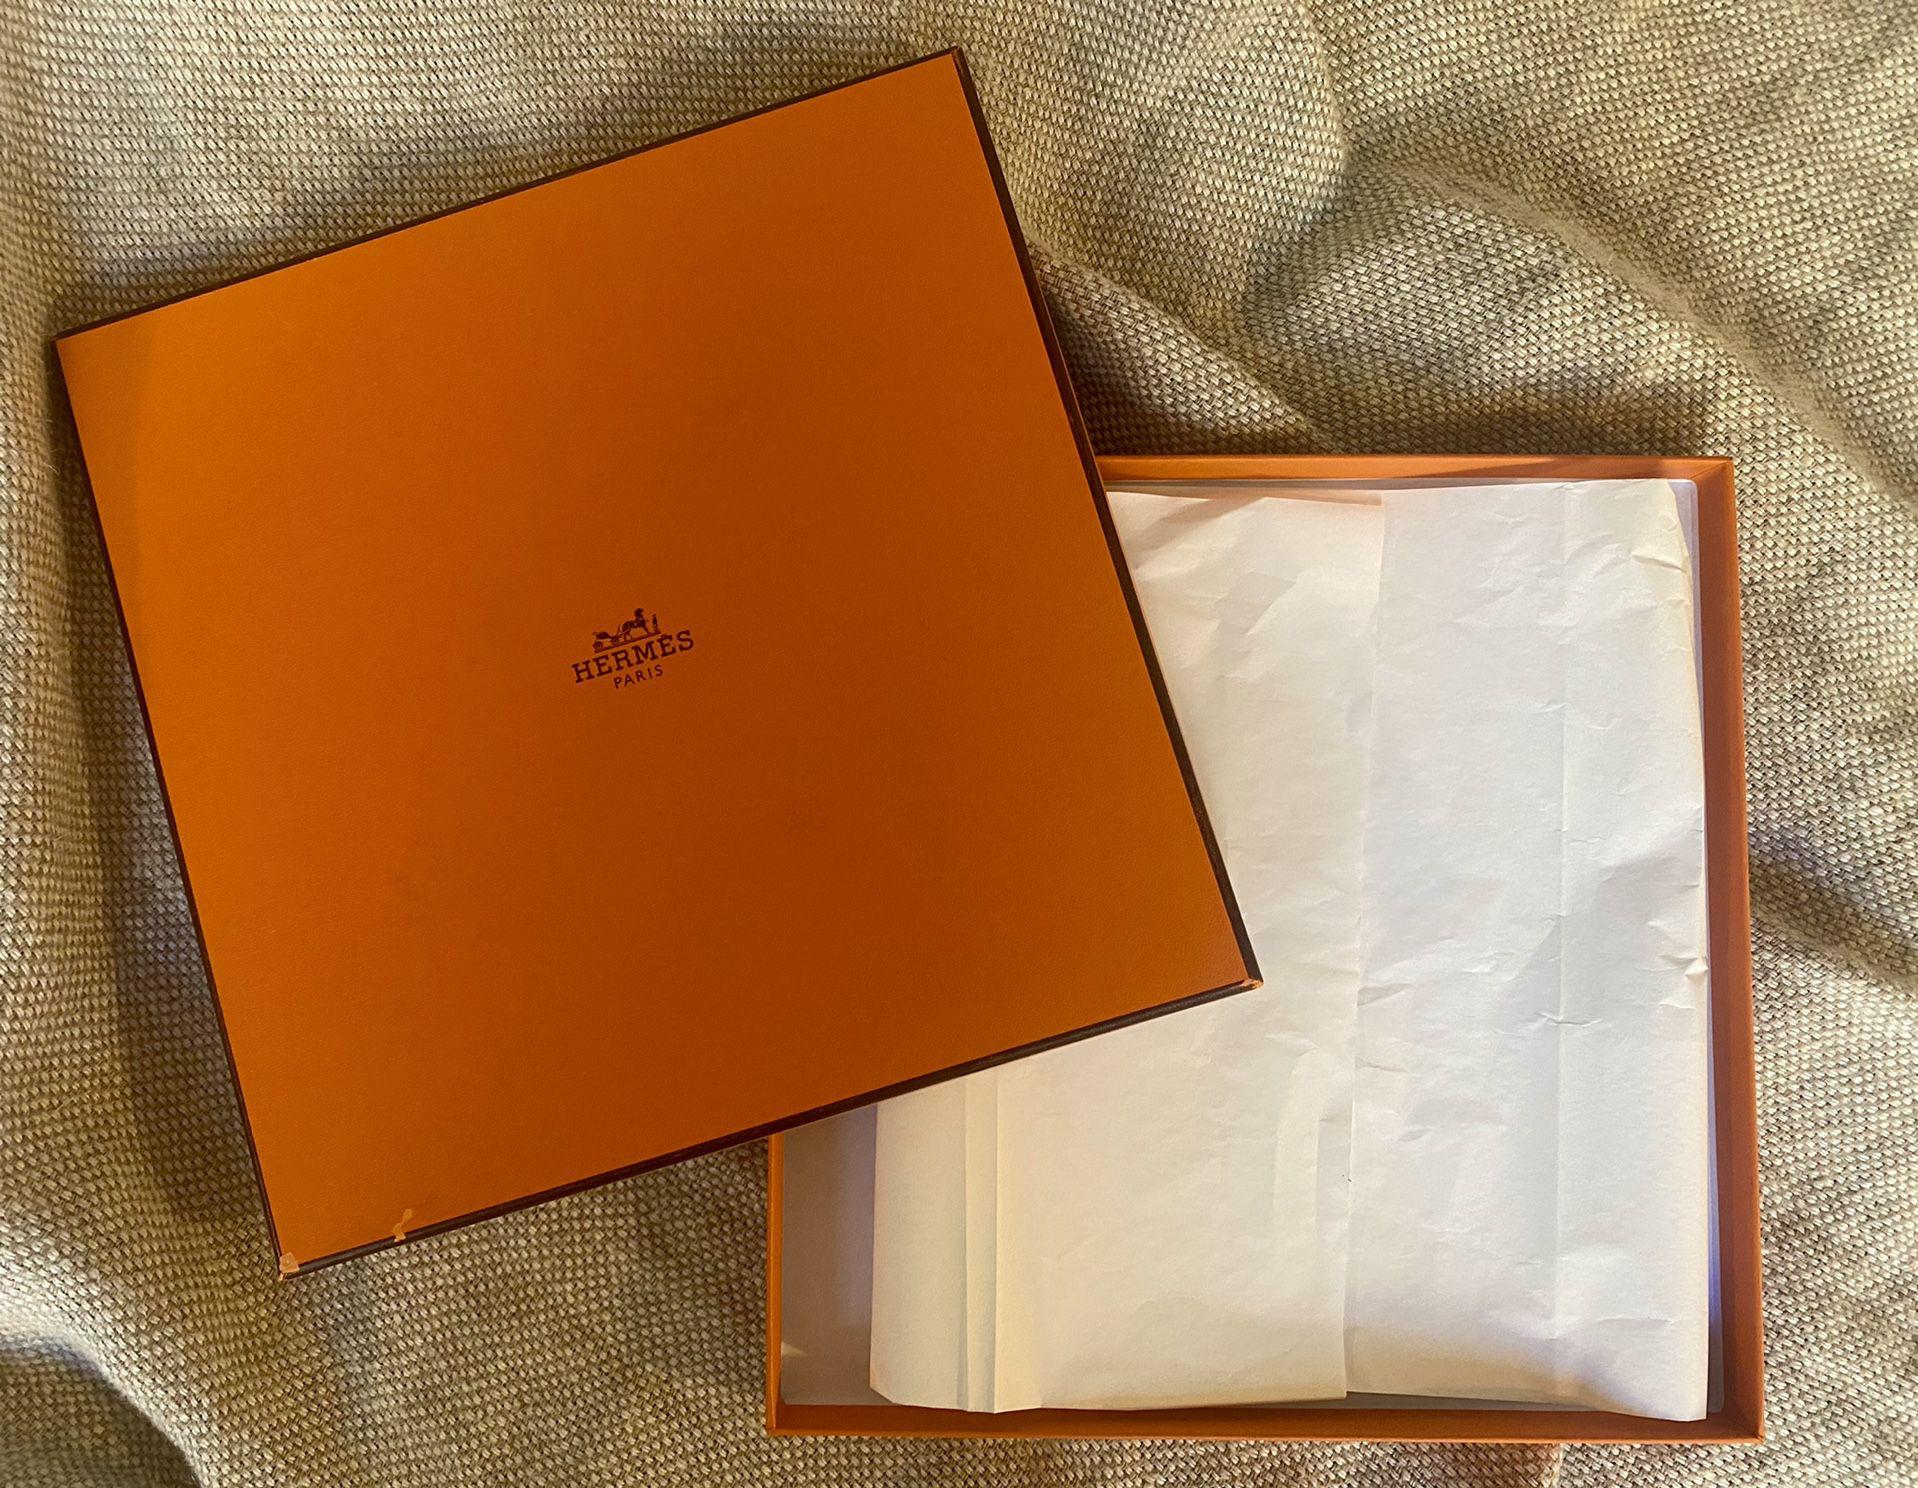 Hermès Le Tour Du Monde Silk Scarf / Artwork